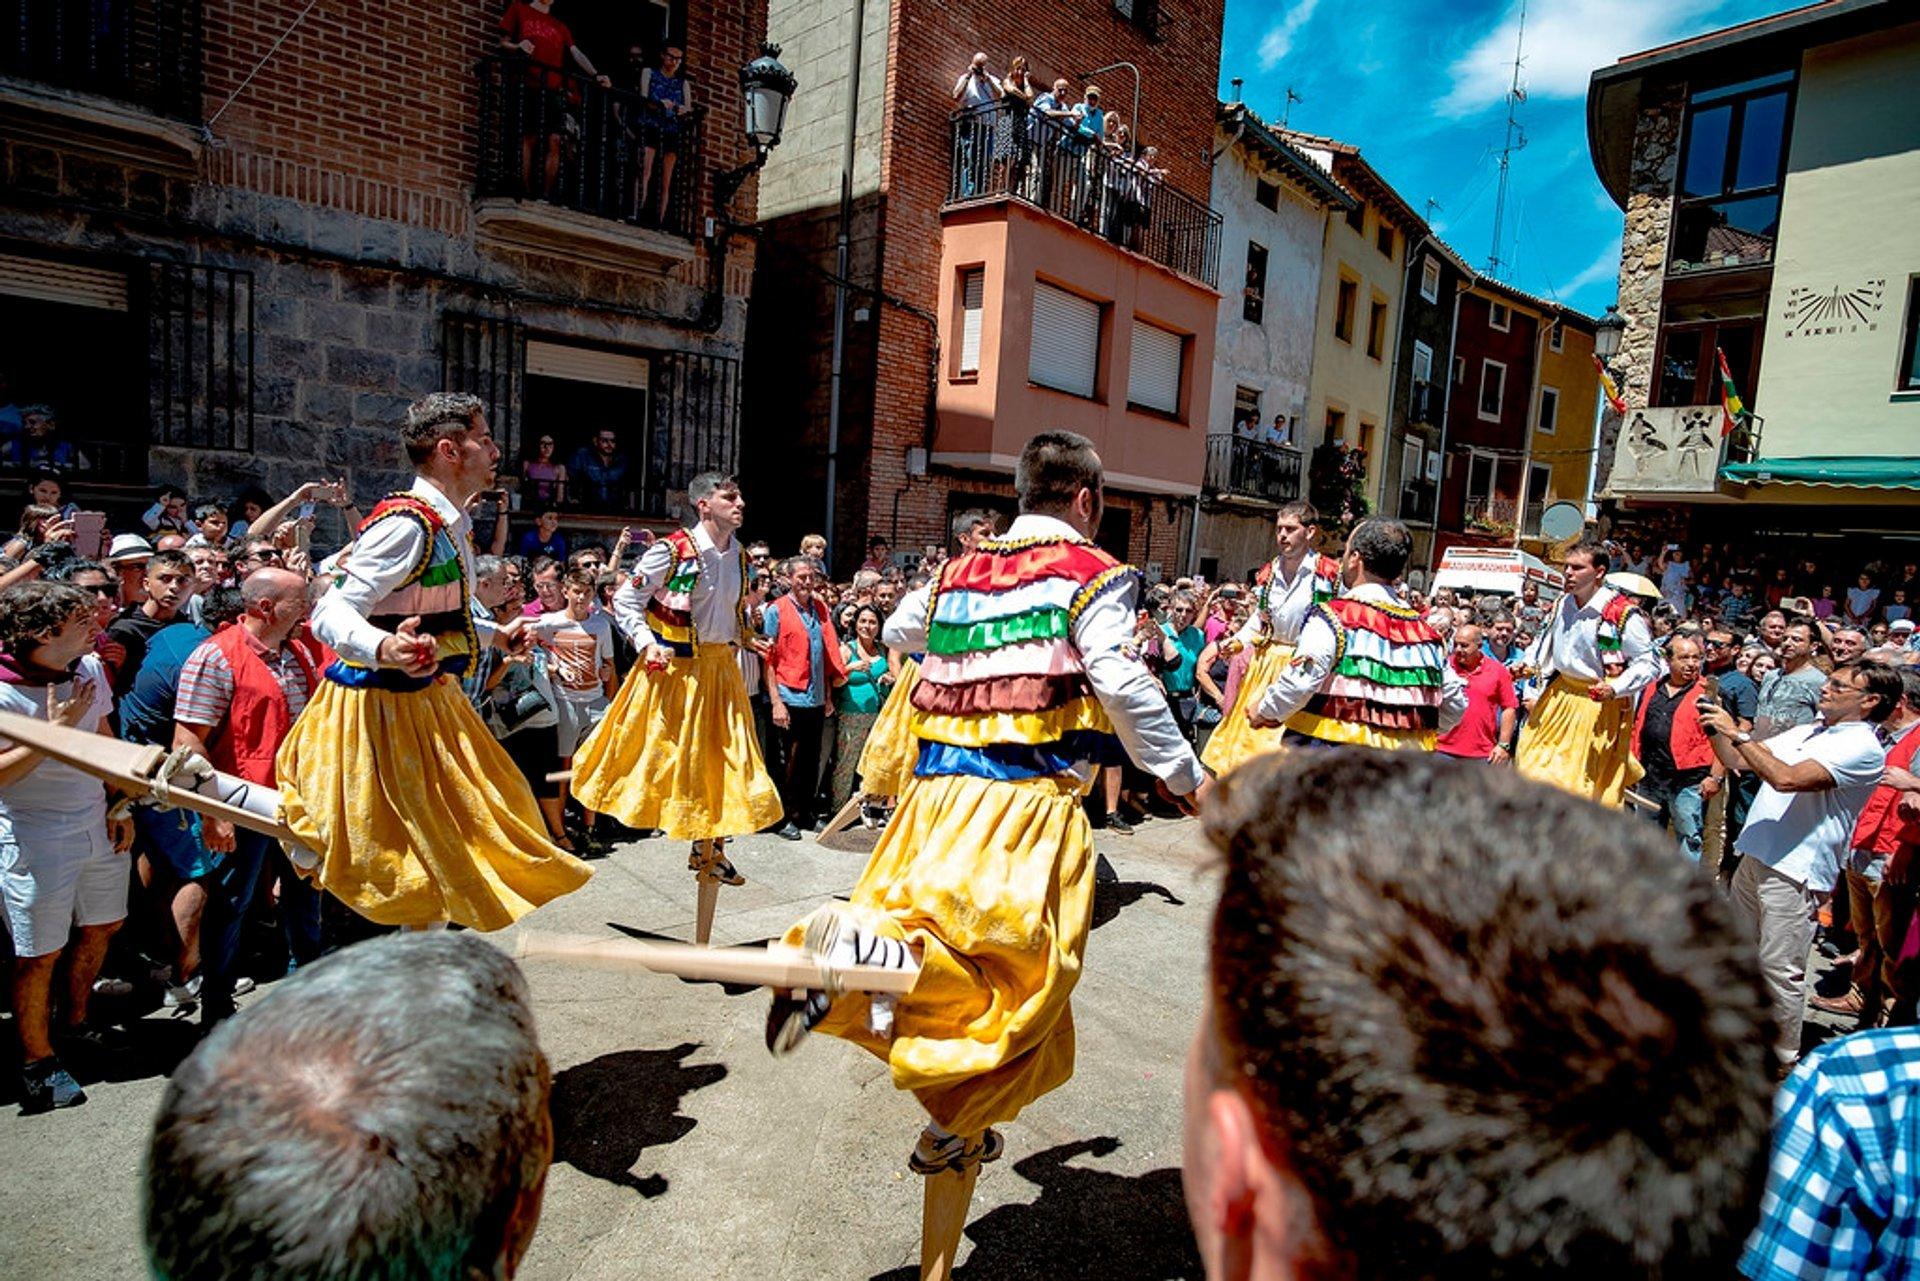 Anguiano Stilt Dance in Spain 2019 - Best Time